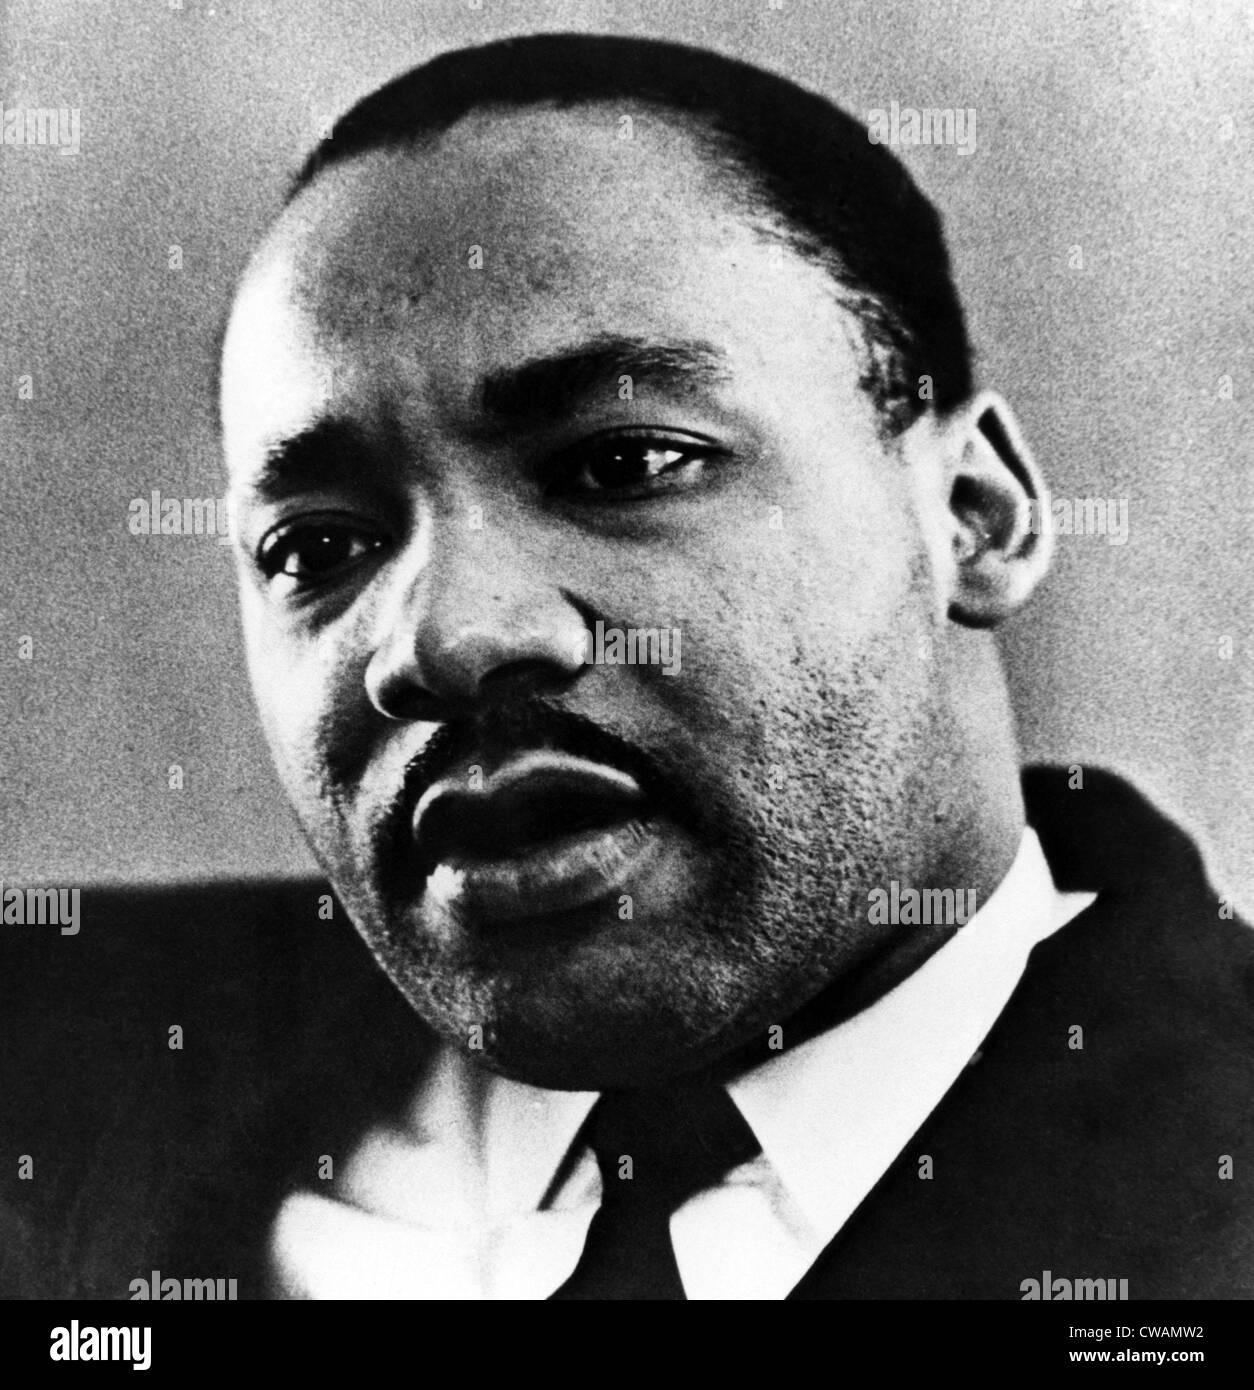 Martin Luther King Jr Awarded Nobel Peace Prize